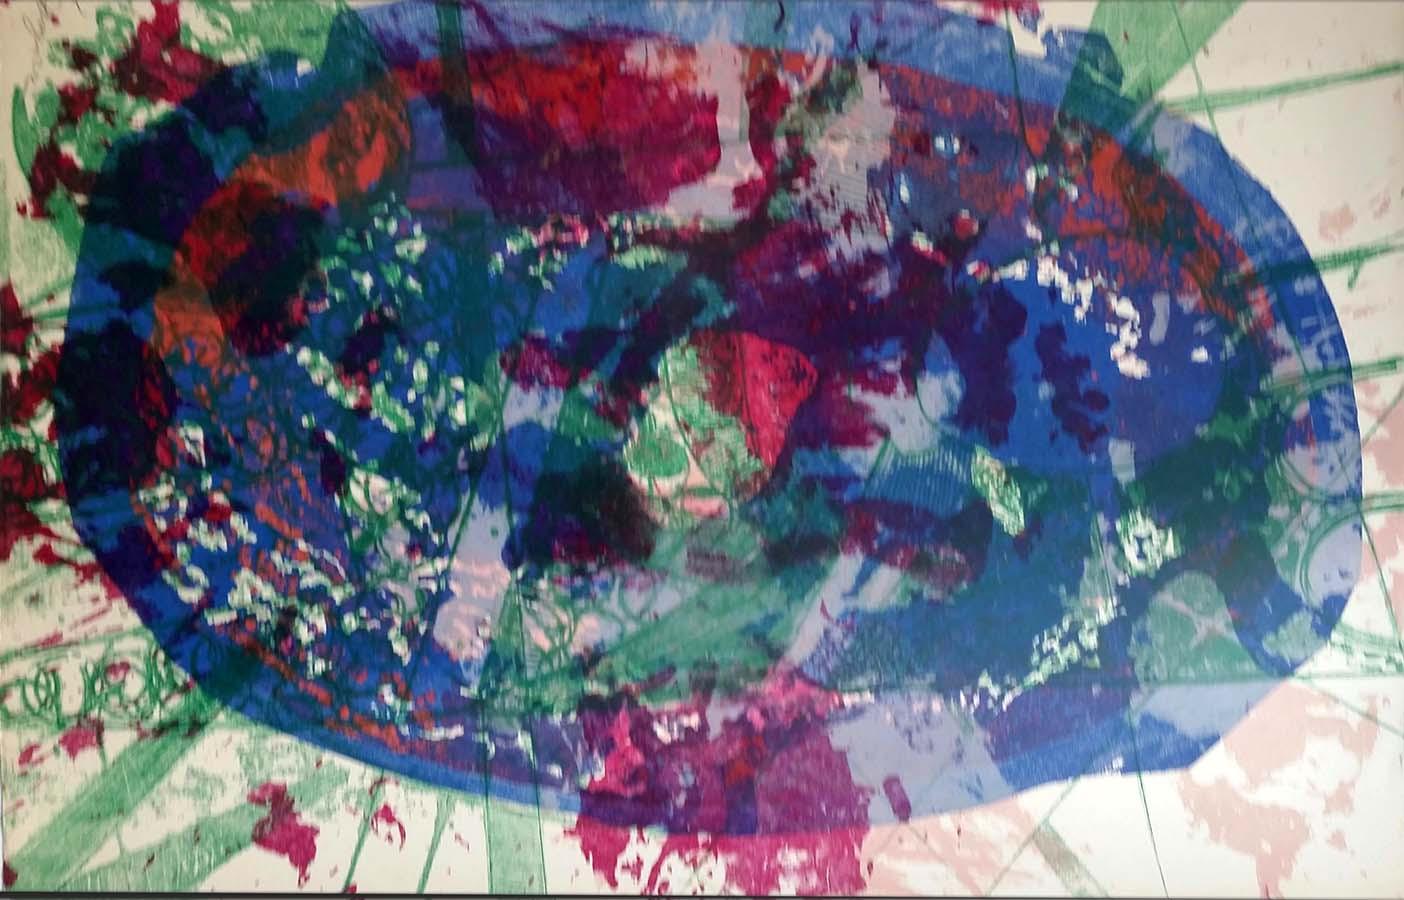 Colorful Abstract Lithograph Loren G Janzen 1972